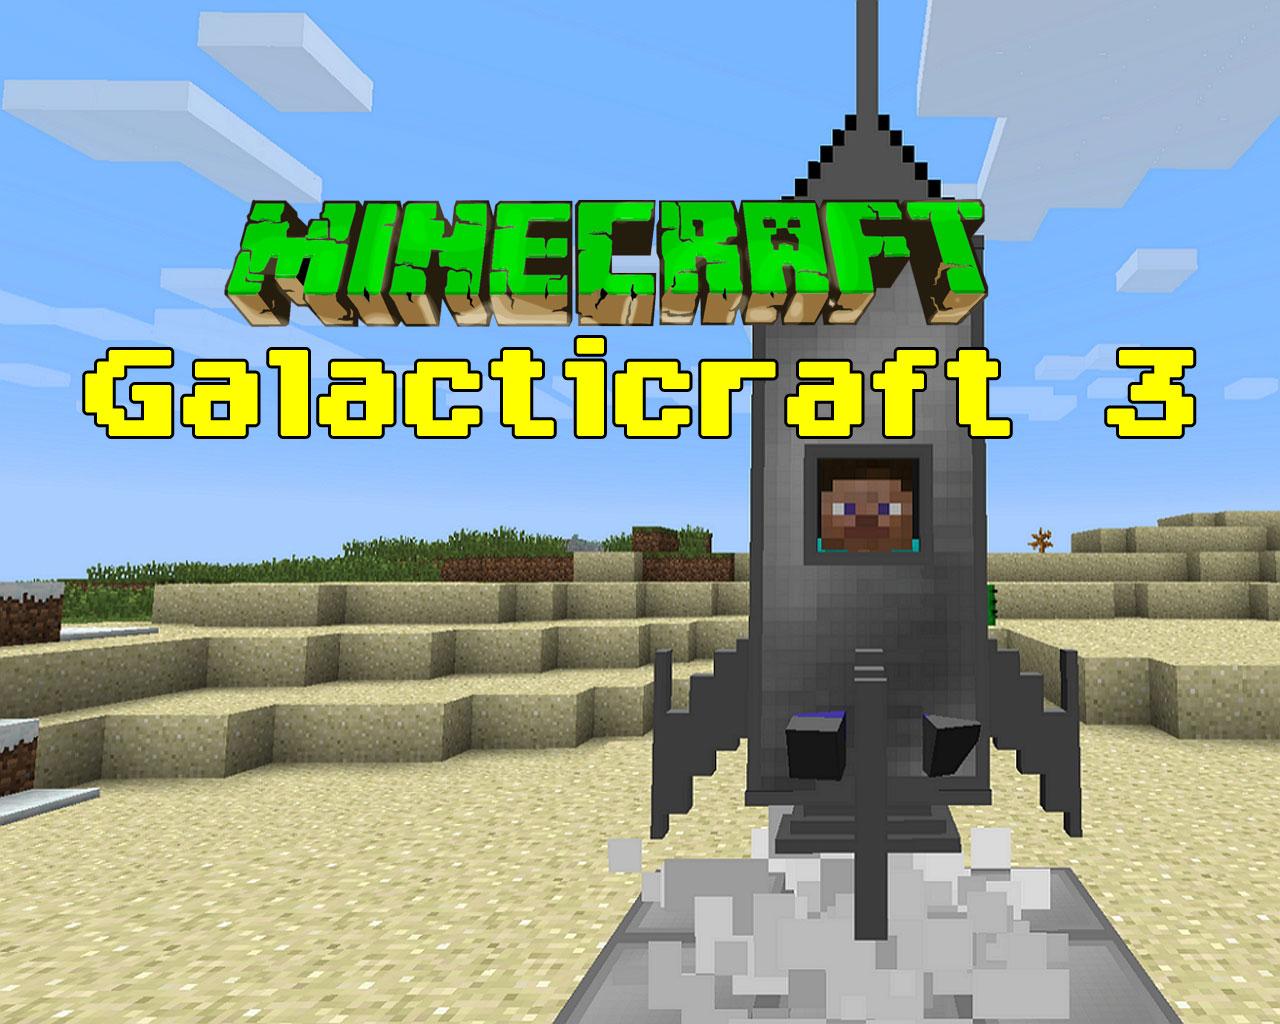 Galacticraft 3 Mod 1.12.2/1.11.2